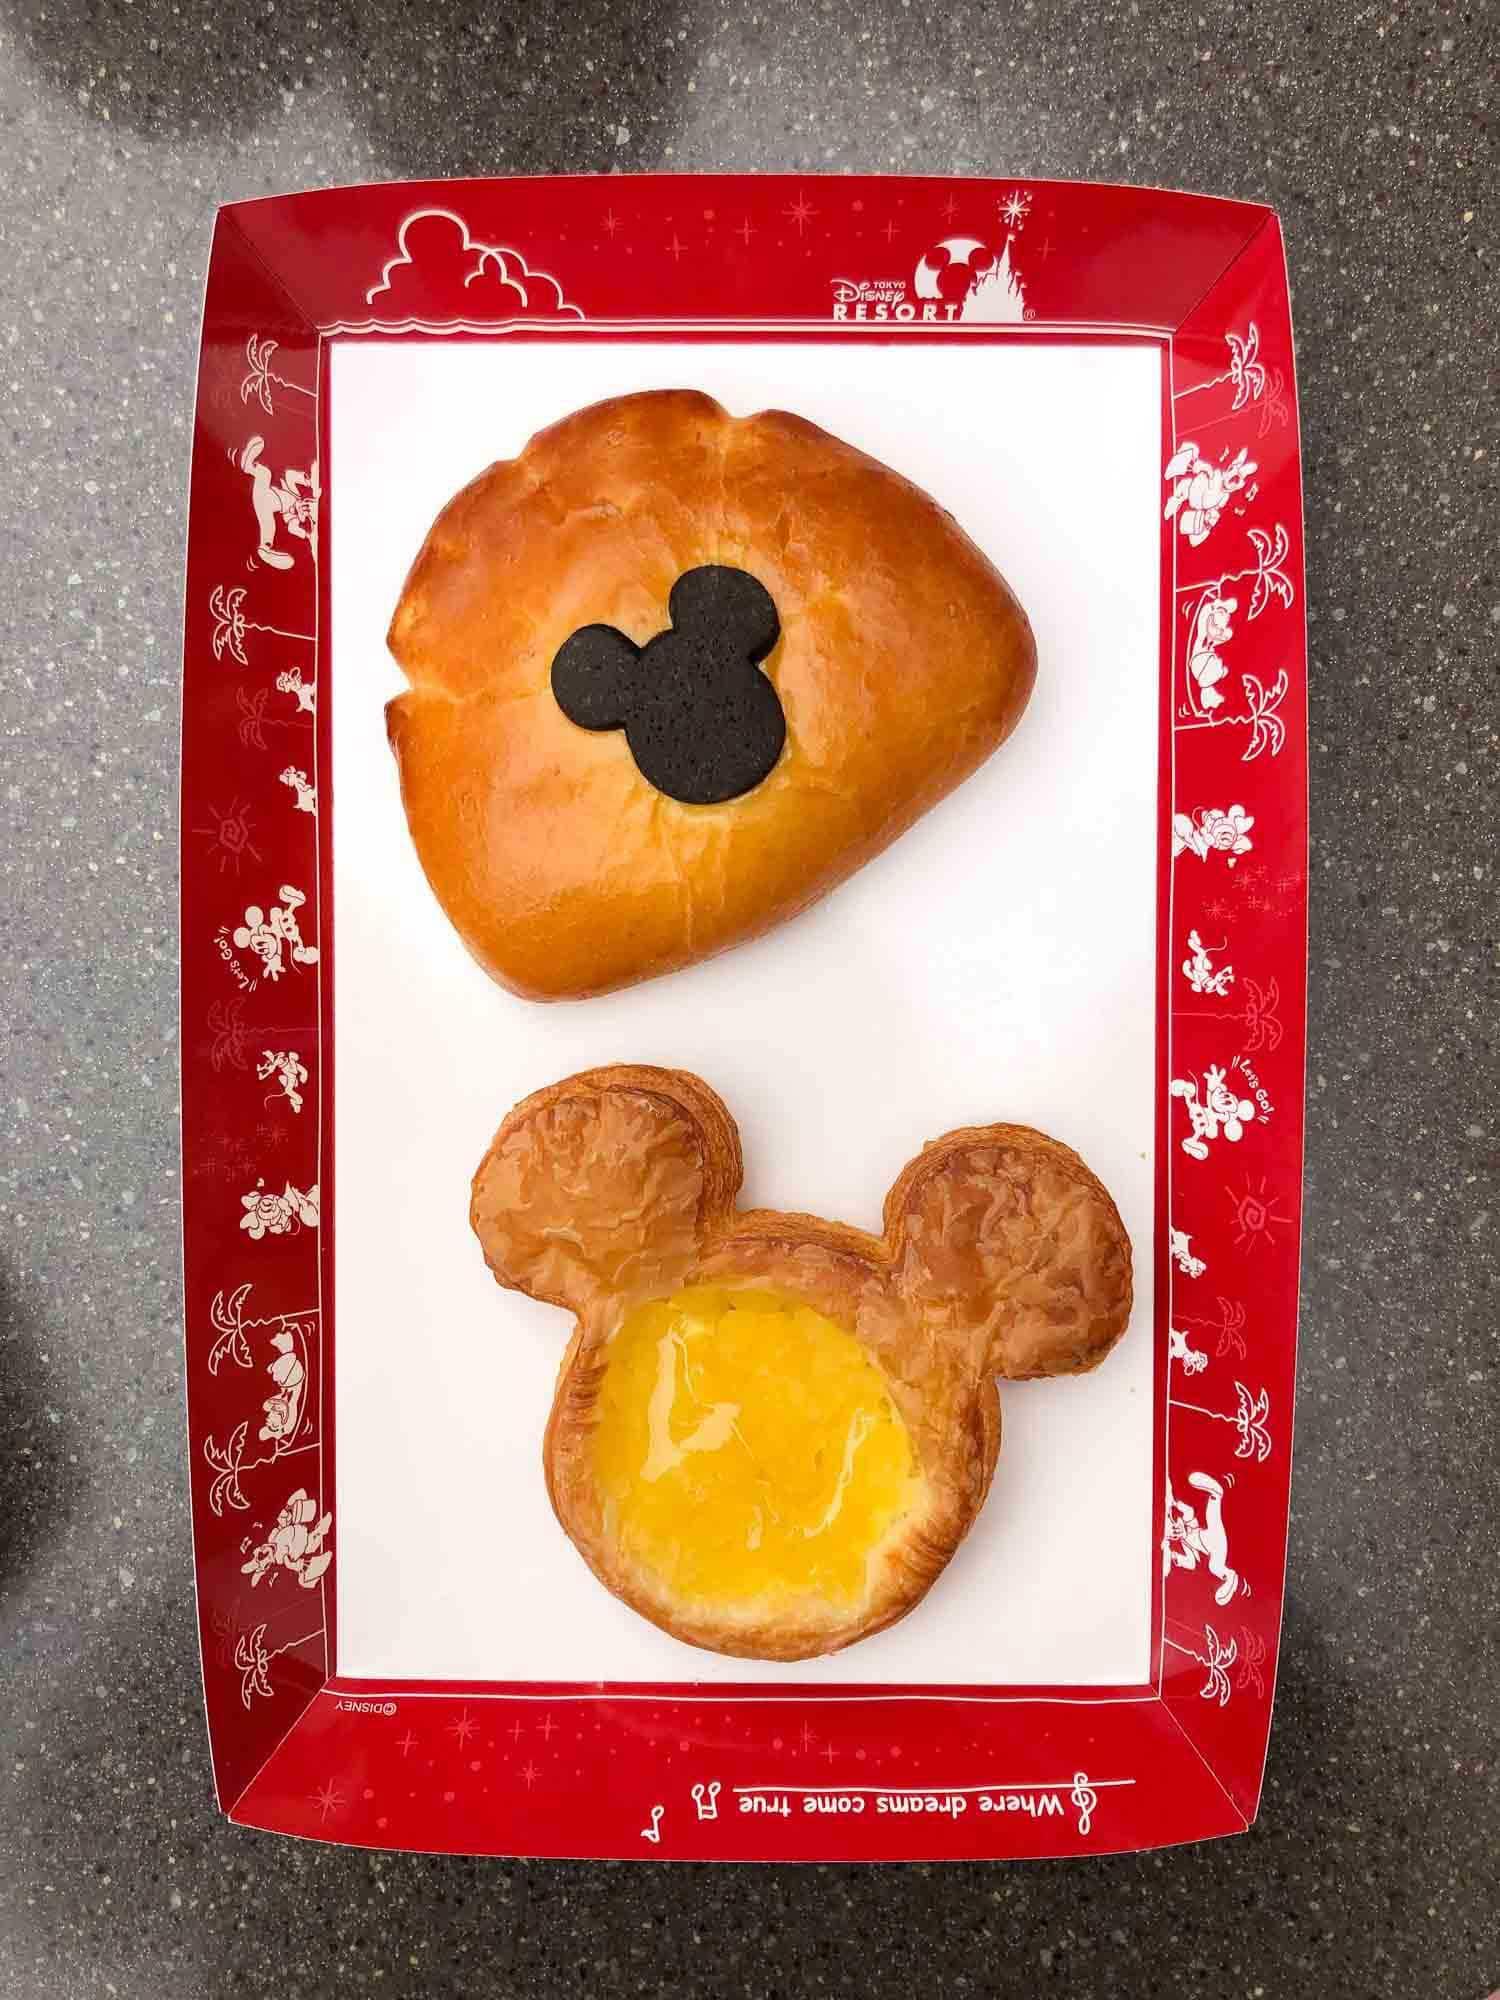 Tokyo Disneysea Bakery